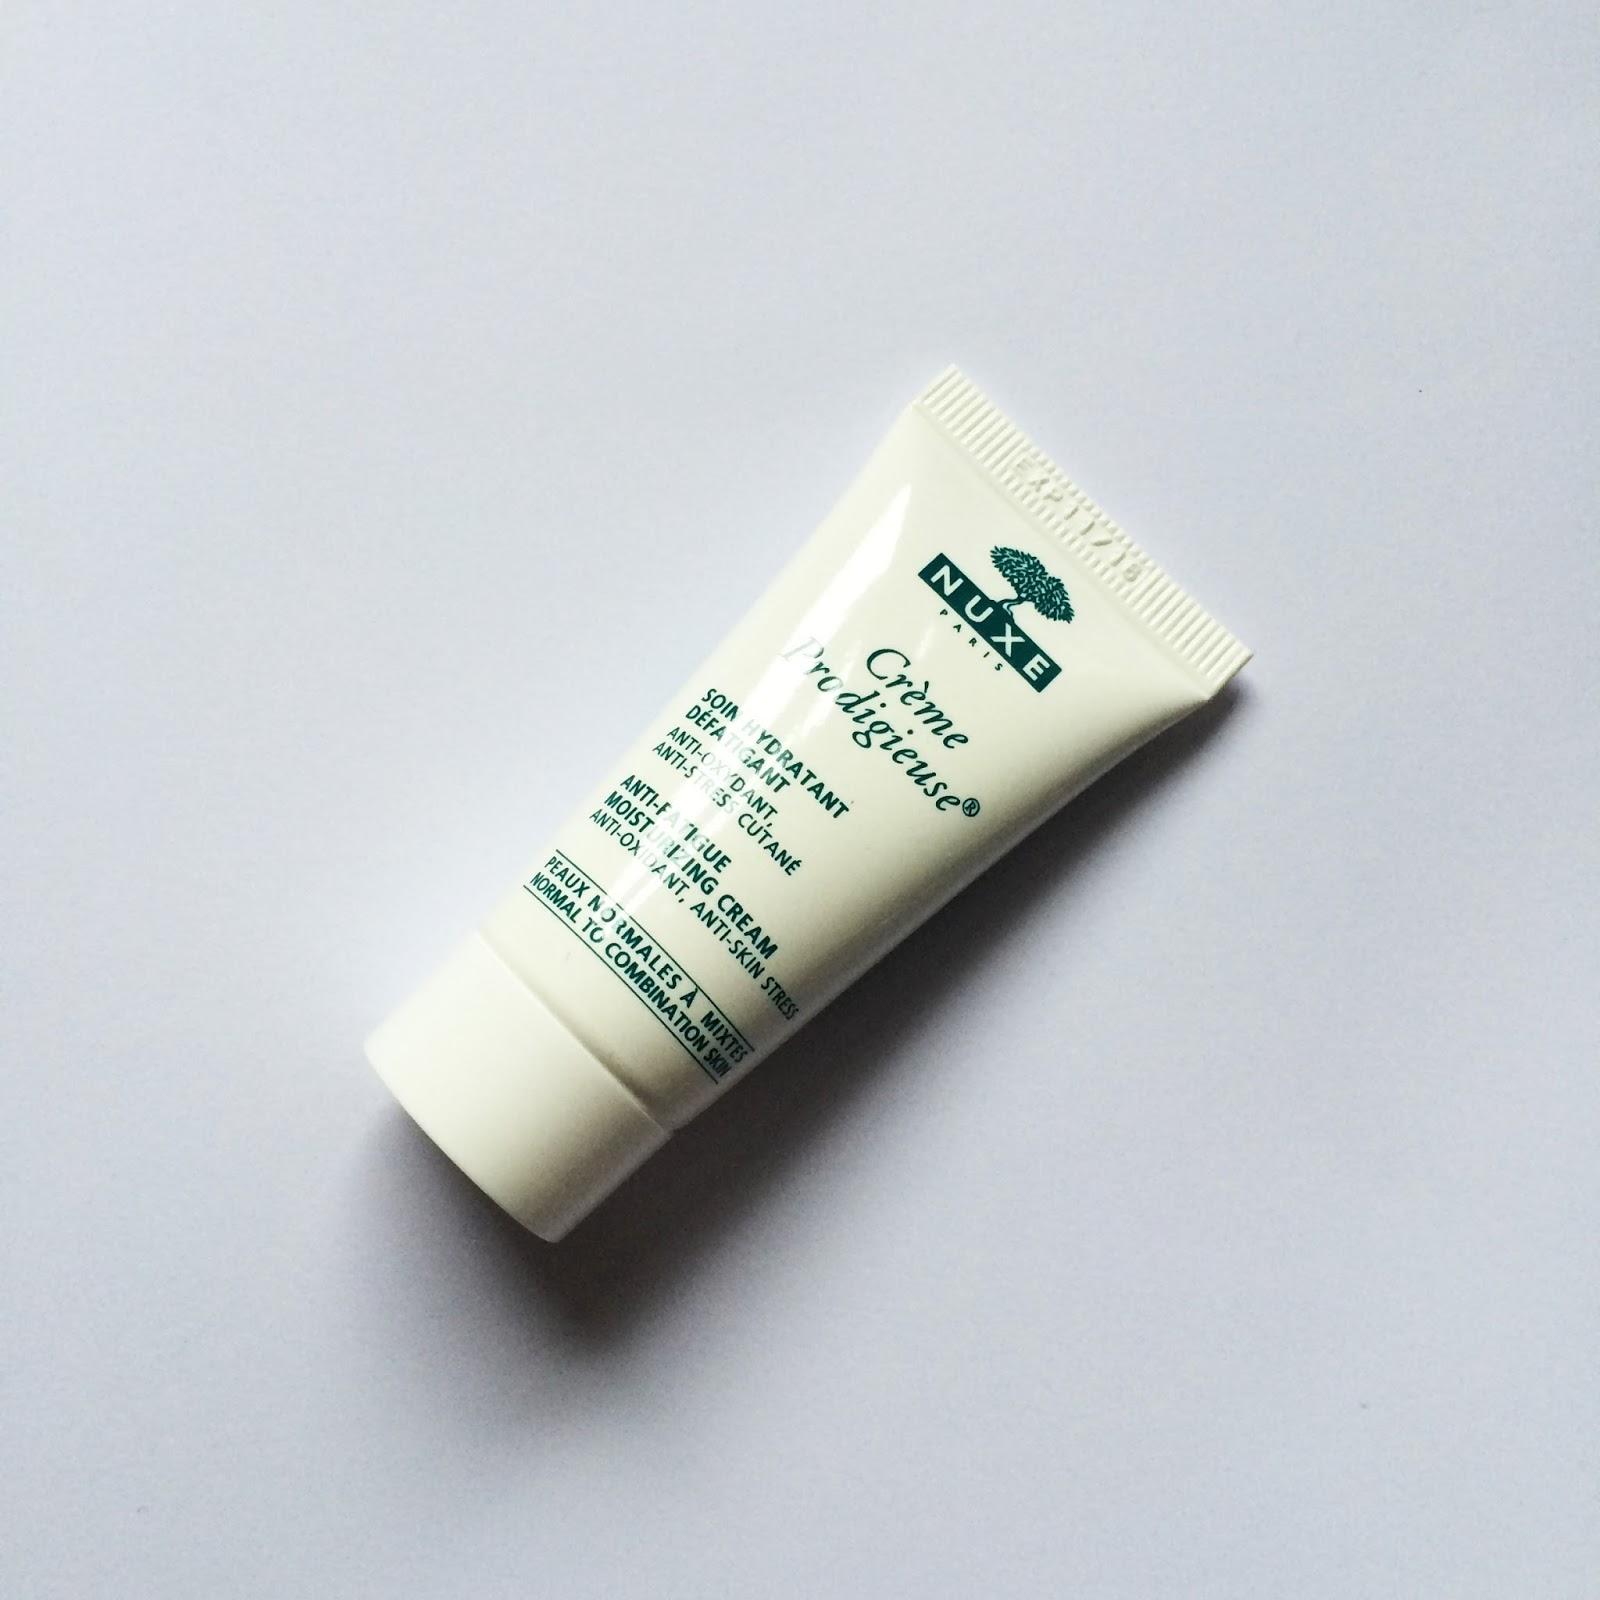 nuxe creme prodigieuse moisturising cream, fashion blogger, skincare